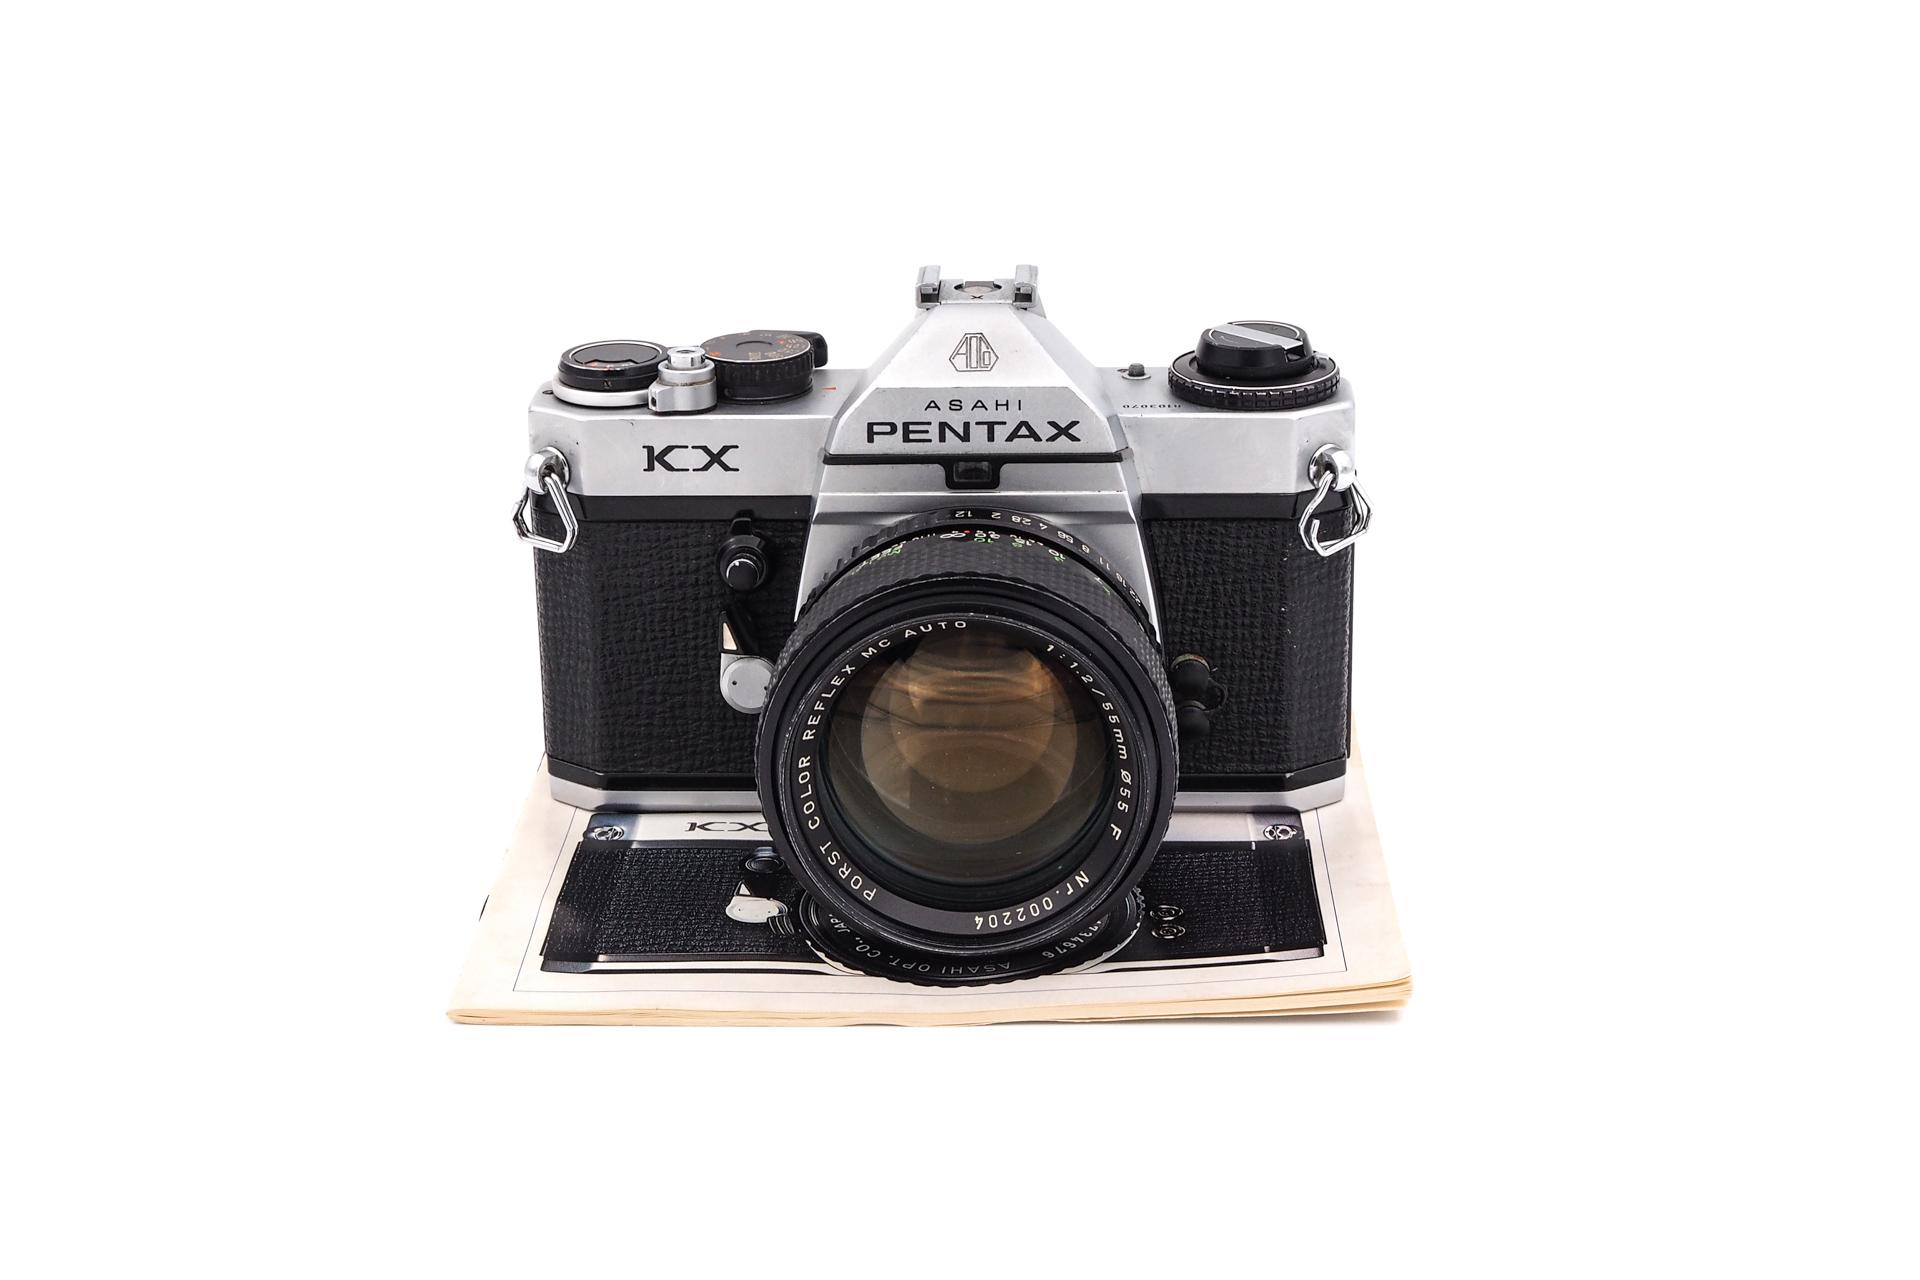 Pentax KX + Porst 55mm F/1.2